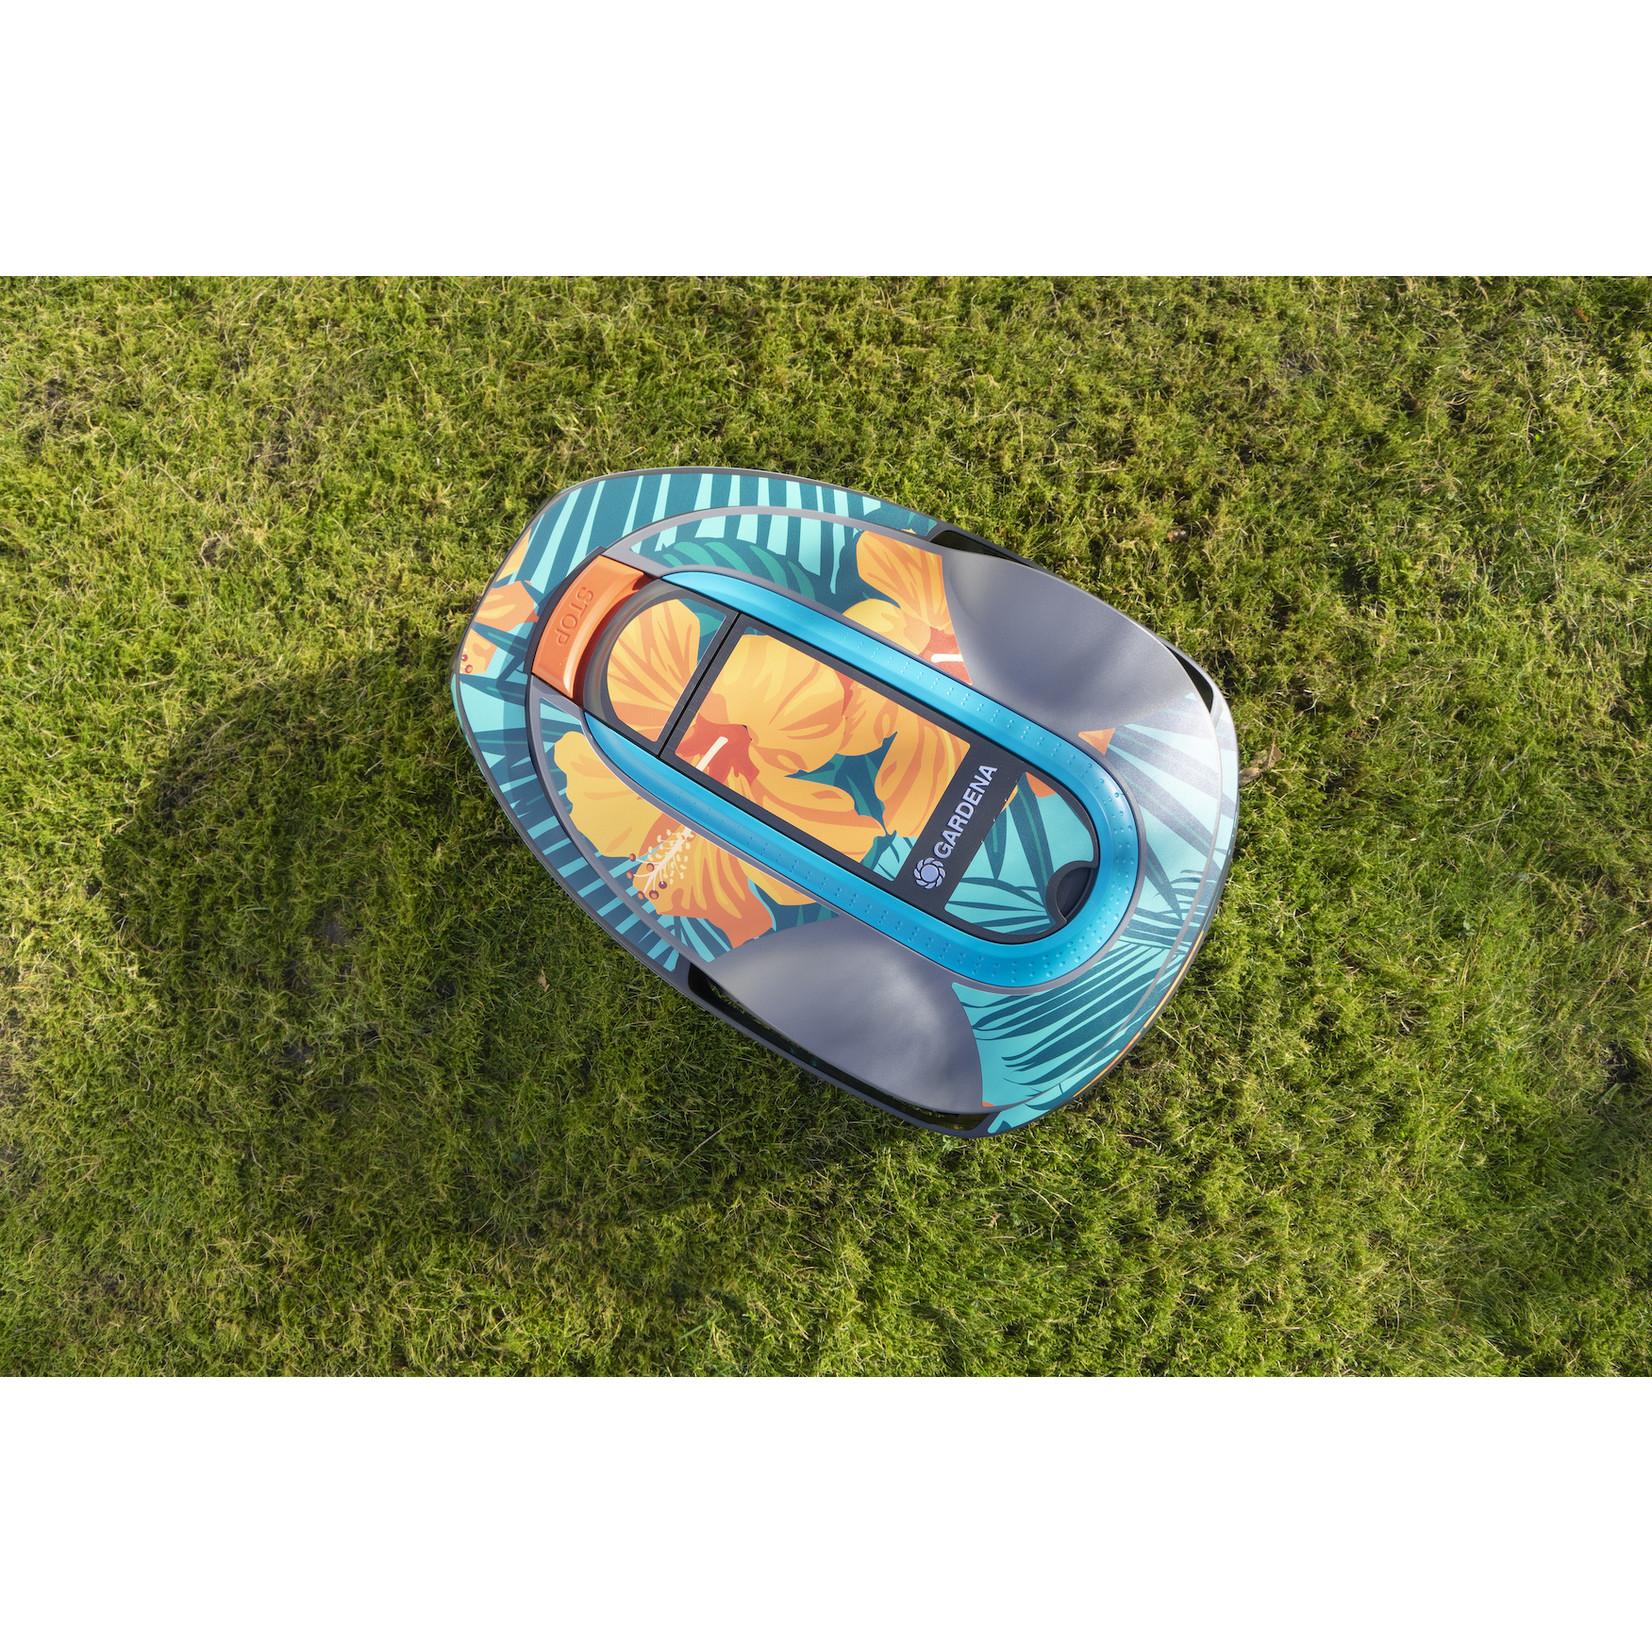 Twinckels Twinckels robotmaaier stickerset (Gardena Sileno) - Hawai